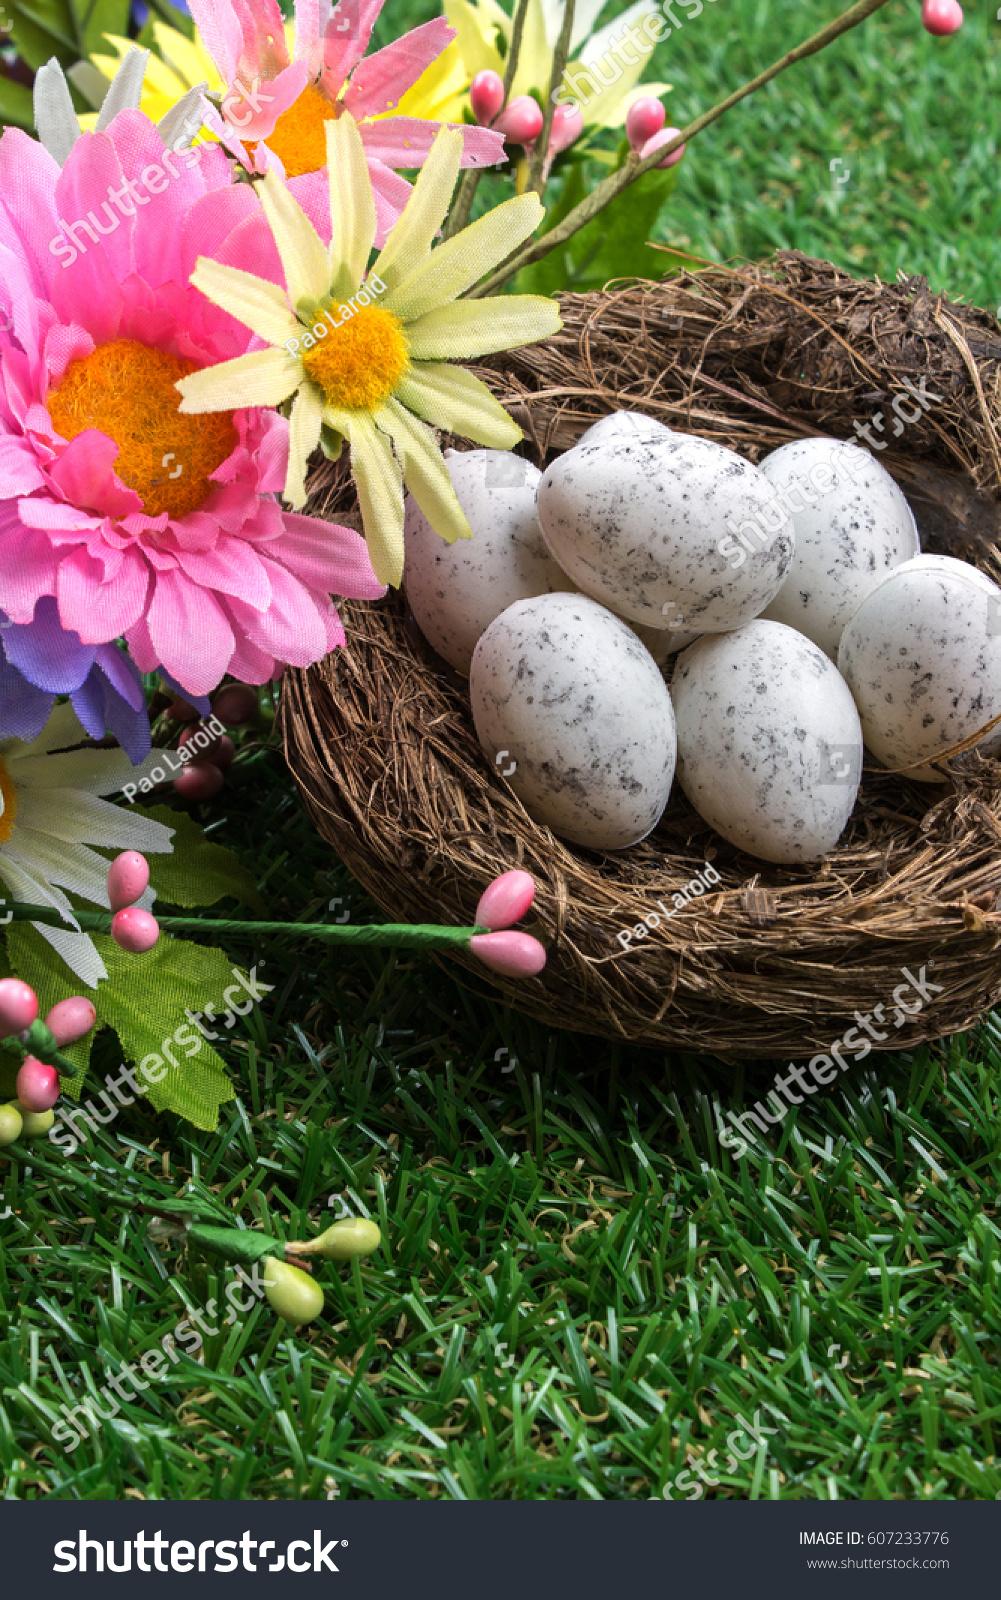 Plastic Easter Eggs Ans Flowers On Stock Photo 607233776